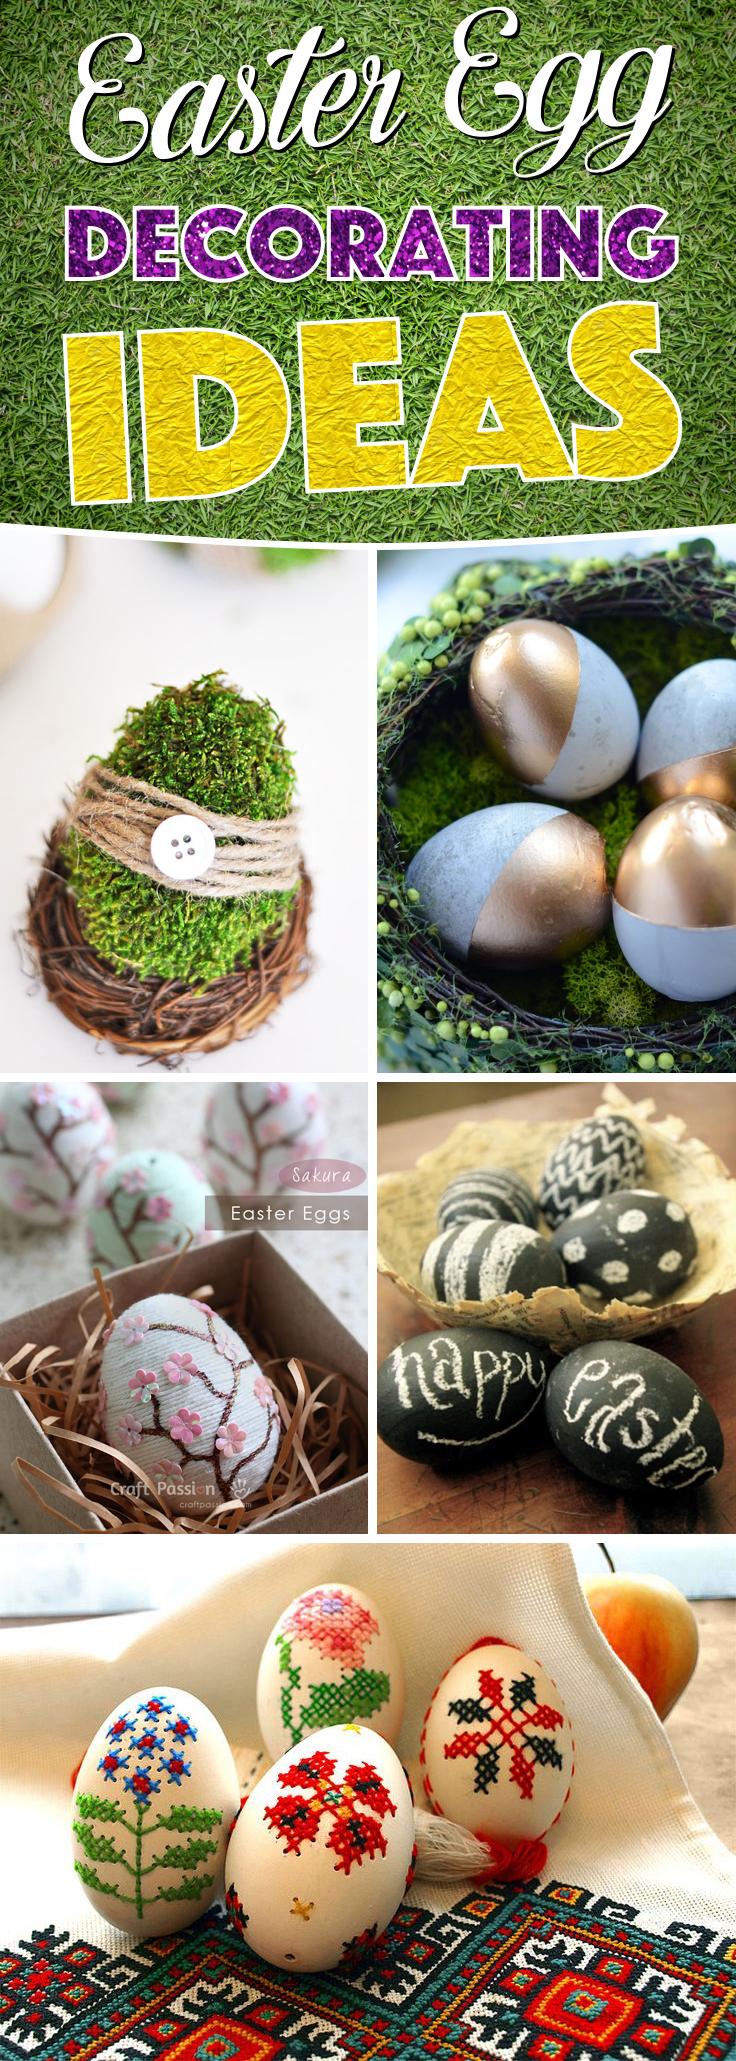 Easter Egg Decorating Ideas For The Artist Hidden Inside You